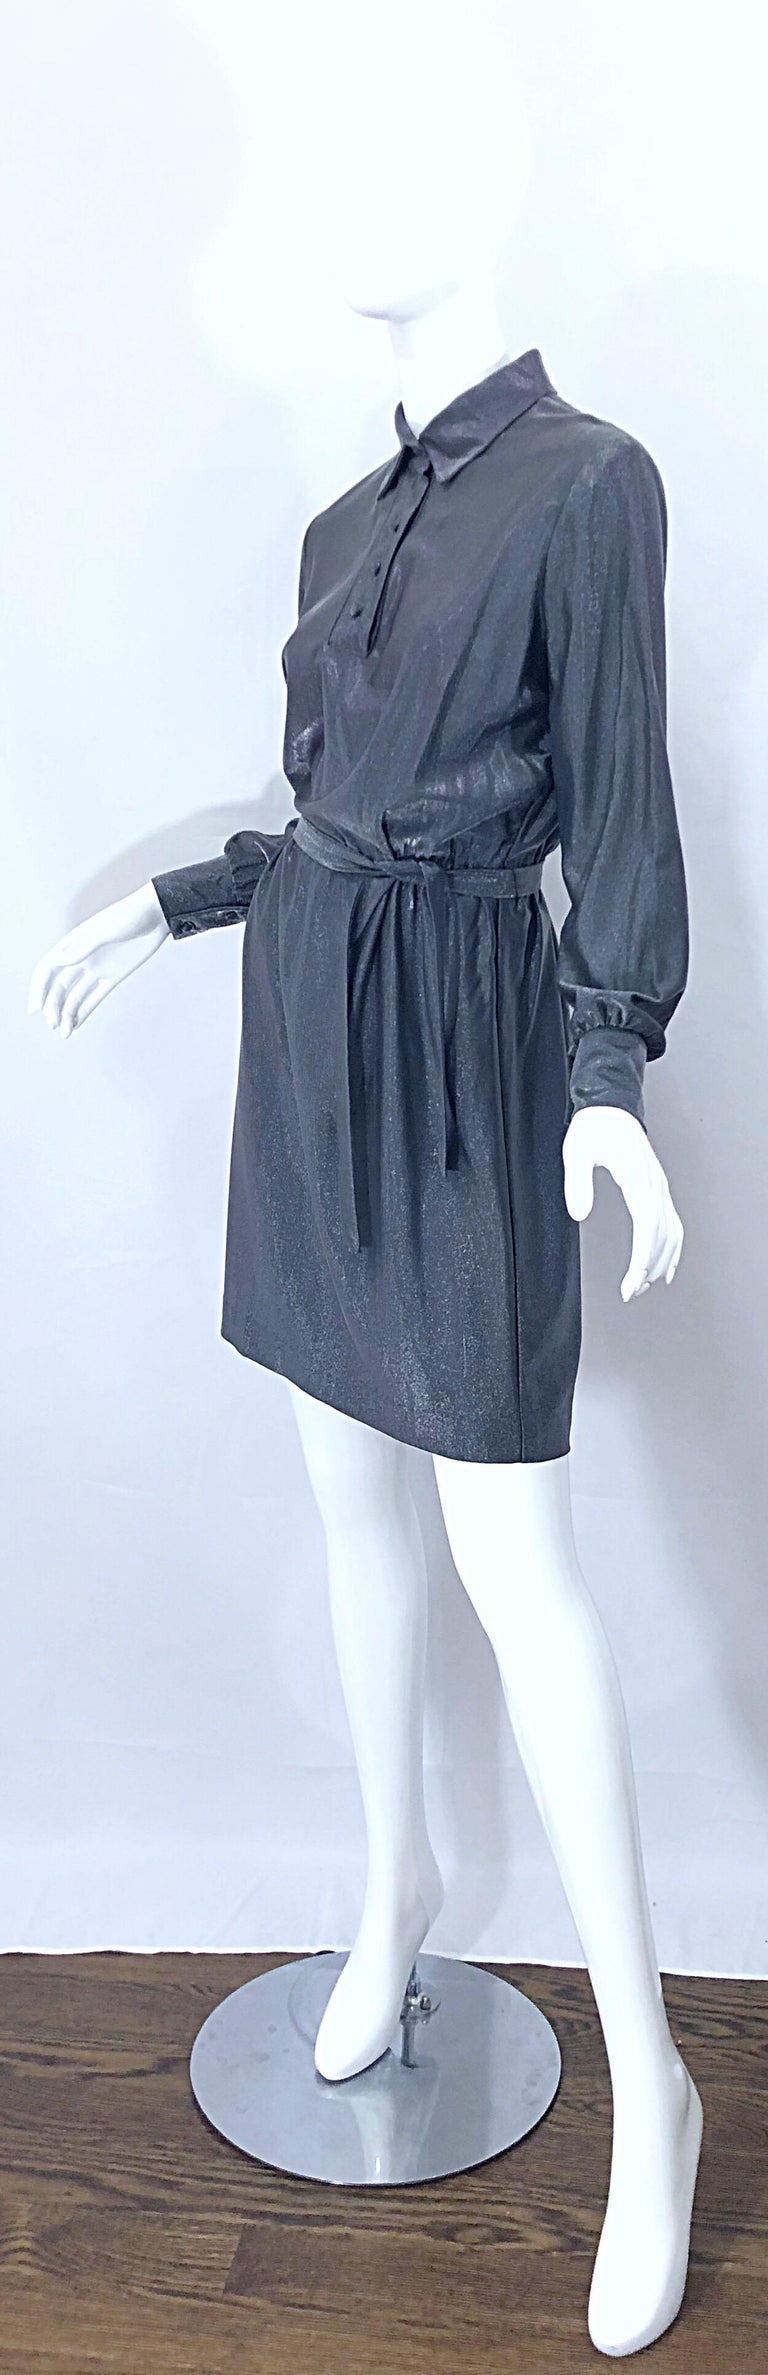 1970s Gunmetal Metallic Silver Gray Belted Vintage 70s Long Sleeve Shirt Dress For Sale 5